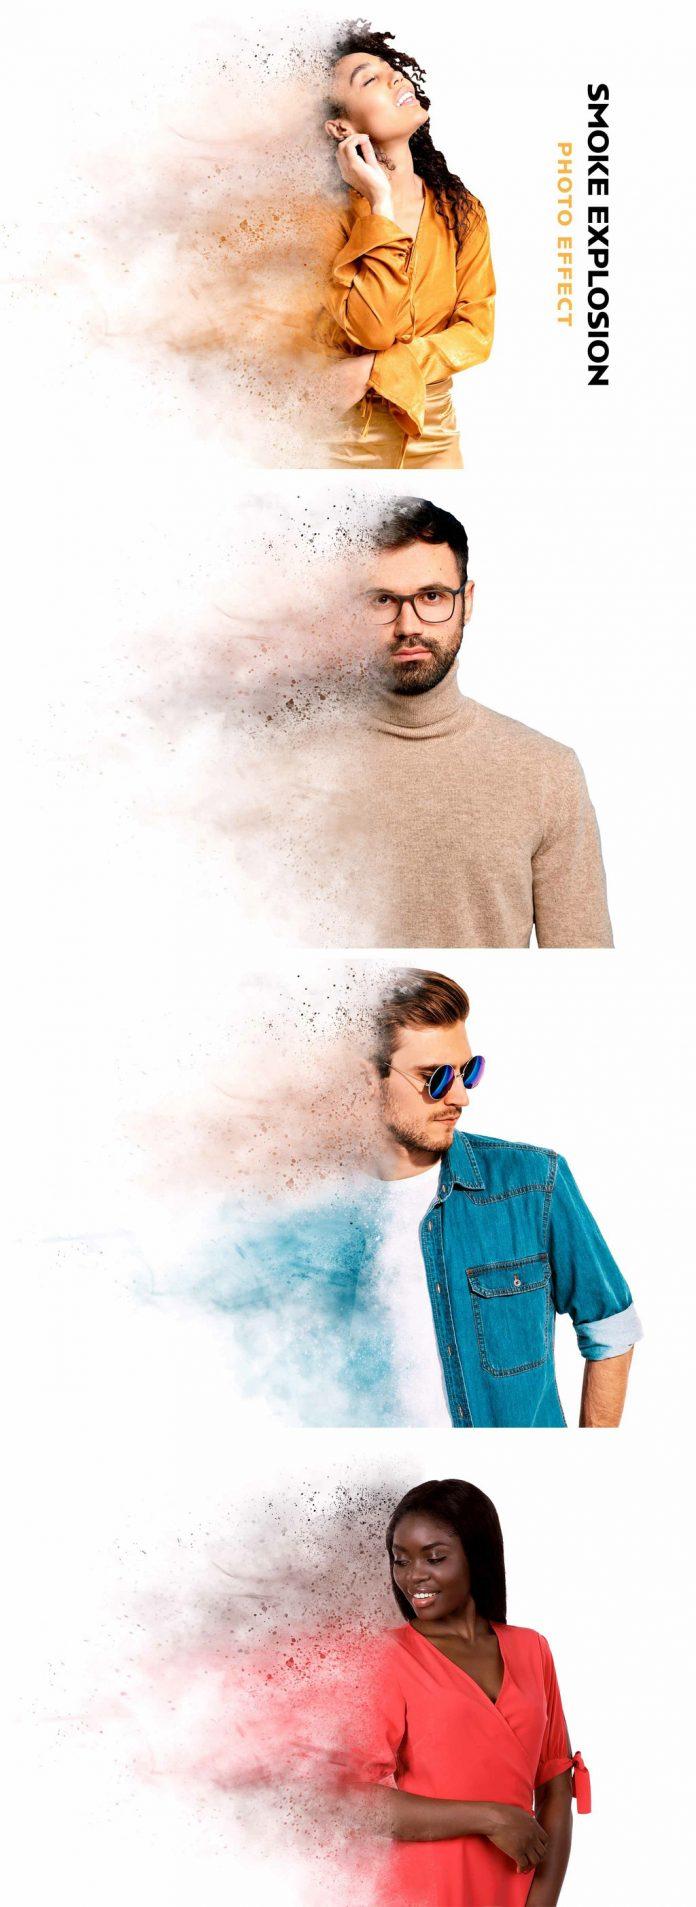 Smoke Explosion Photo Effect Mockup for Adobe Photoshop